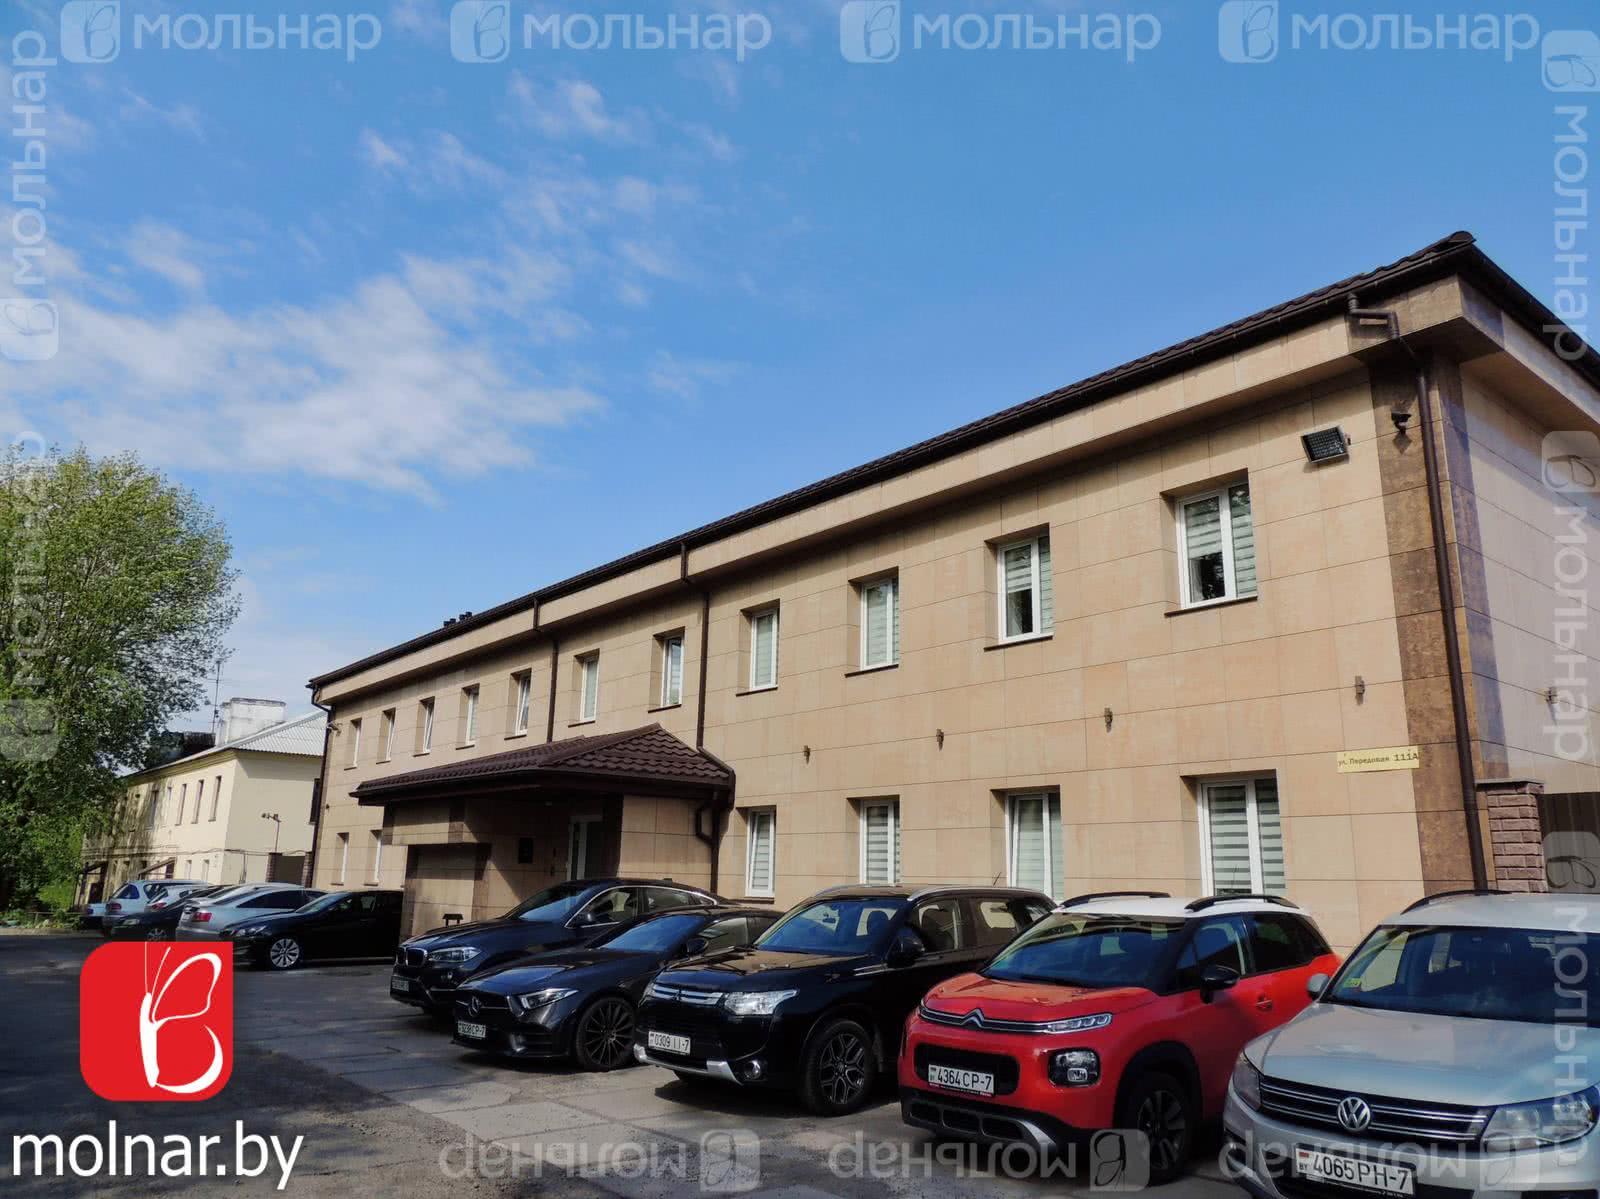 Купить склад на ул. Передовая, д. 111 в Минске - фото 2